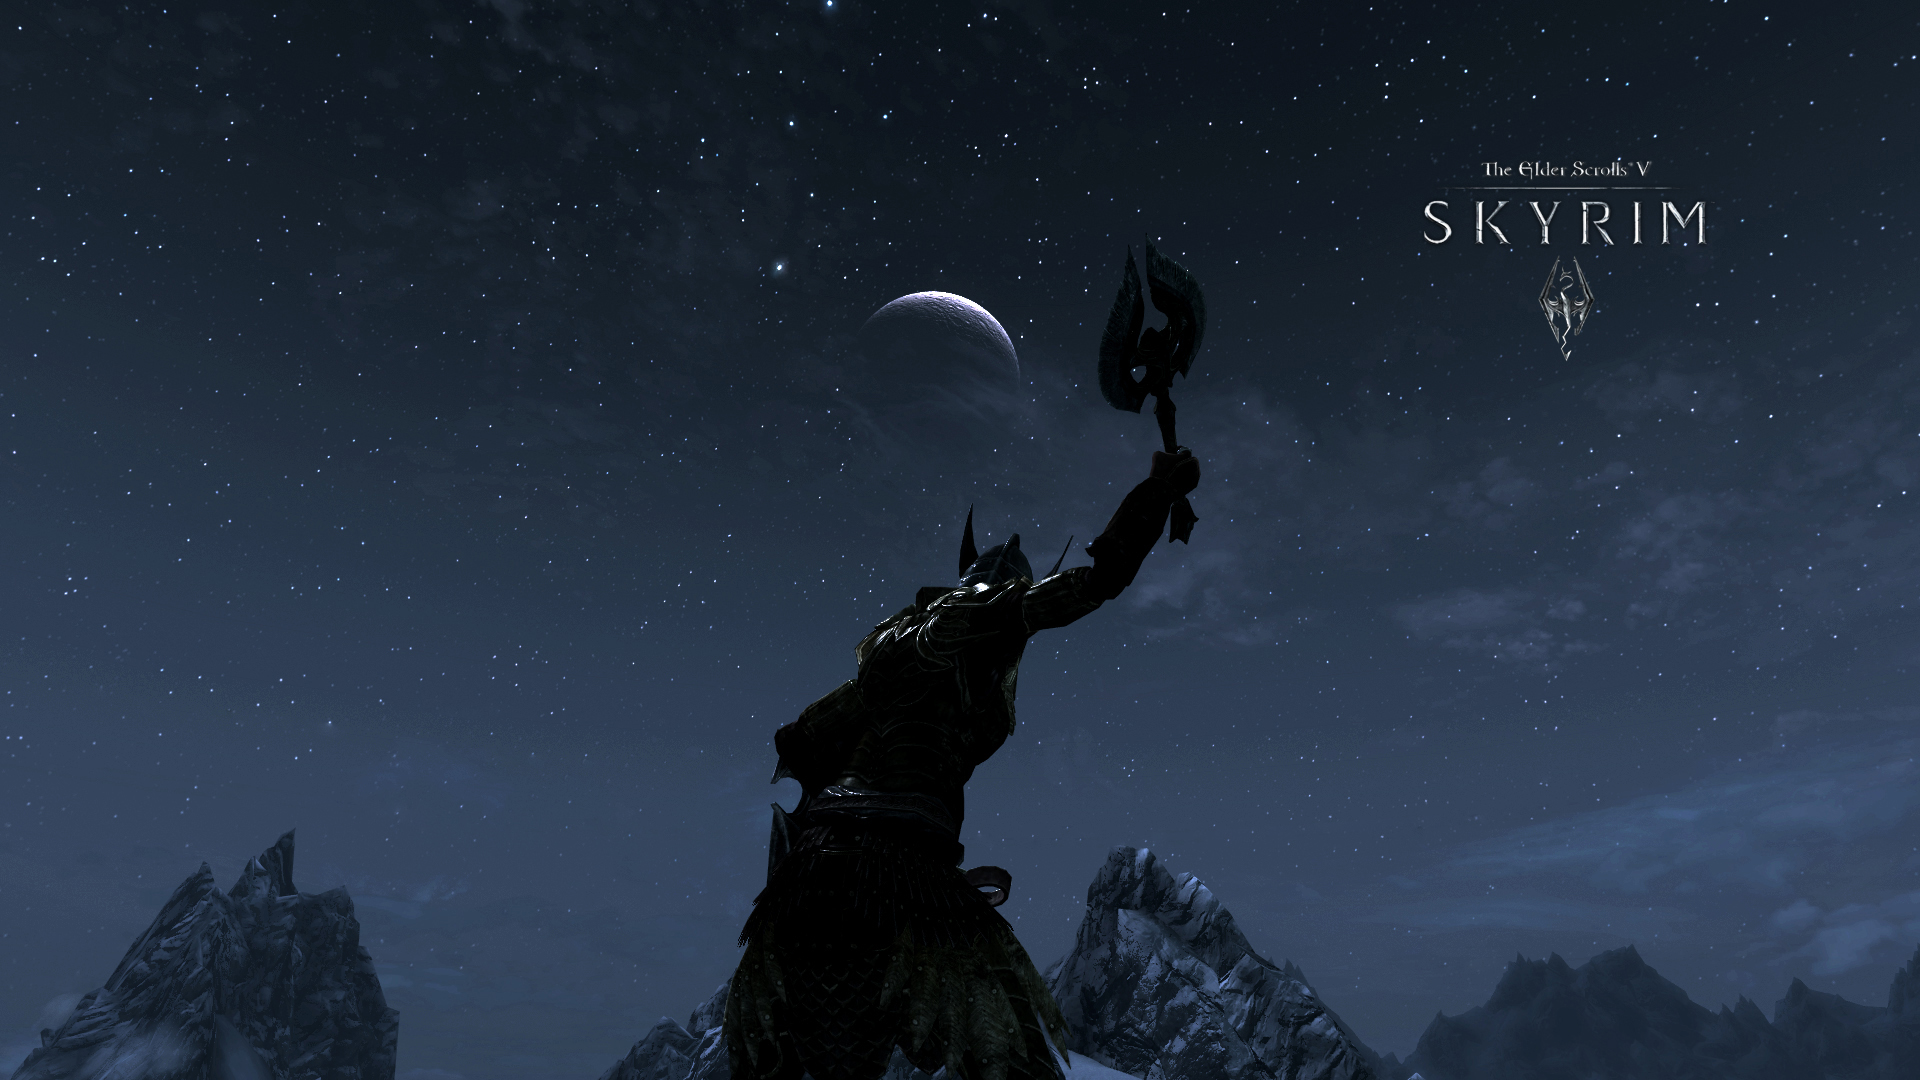 The Elder Scrolls Skyrim Video Game Sky 1920x1080